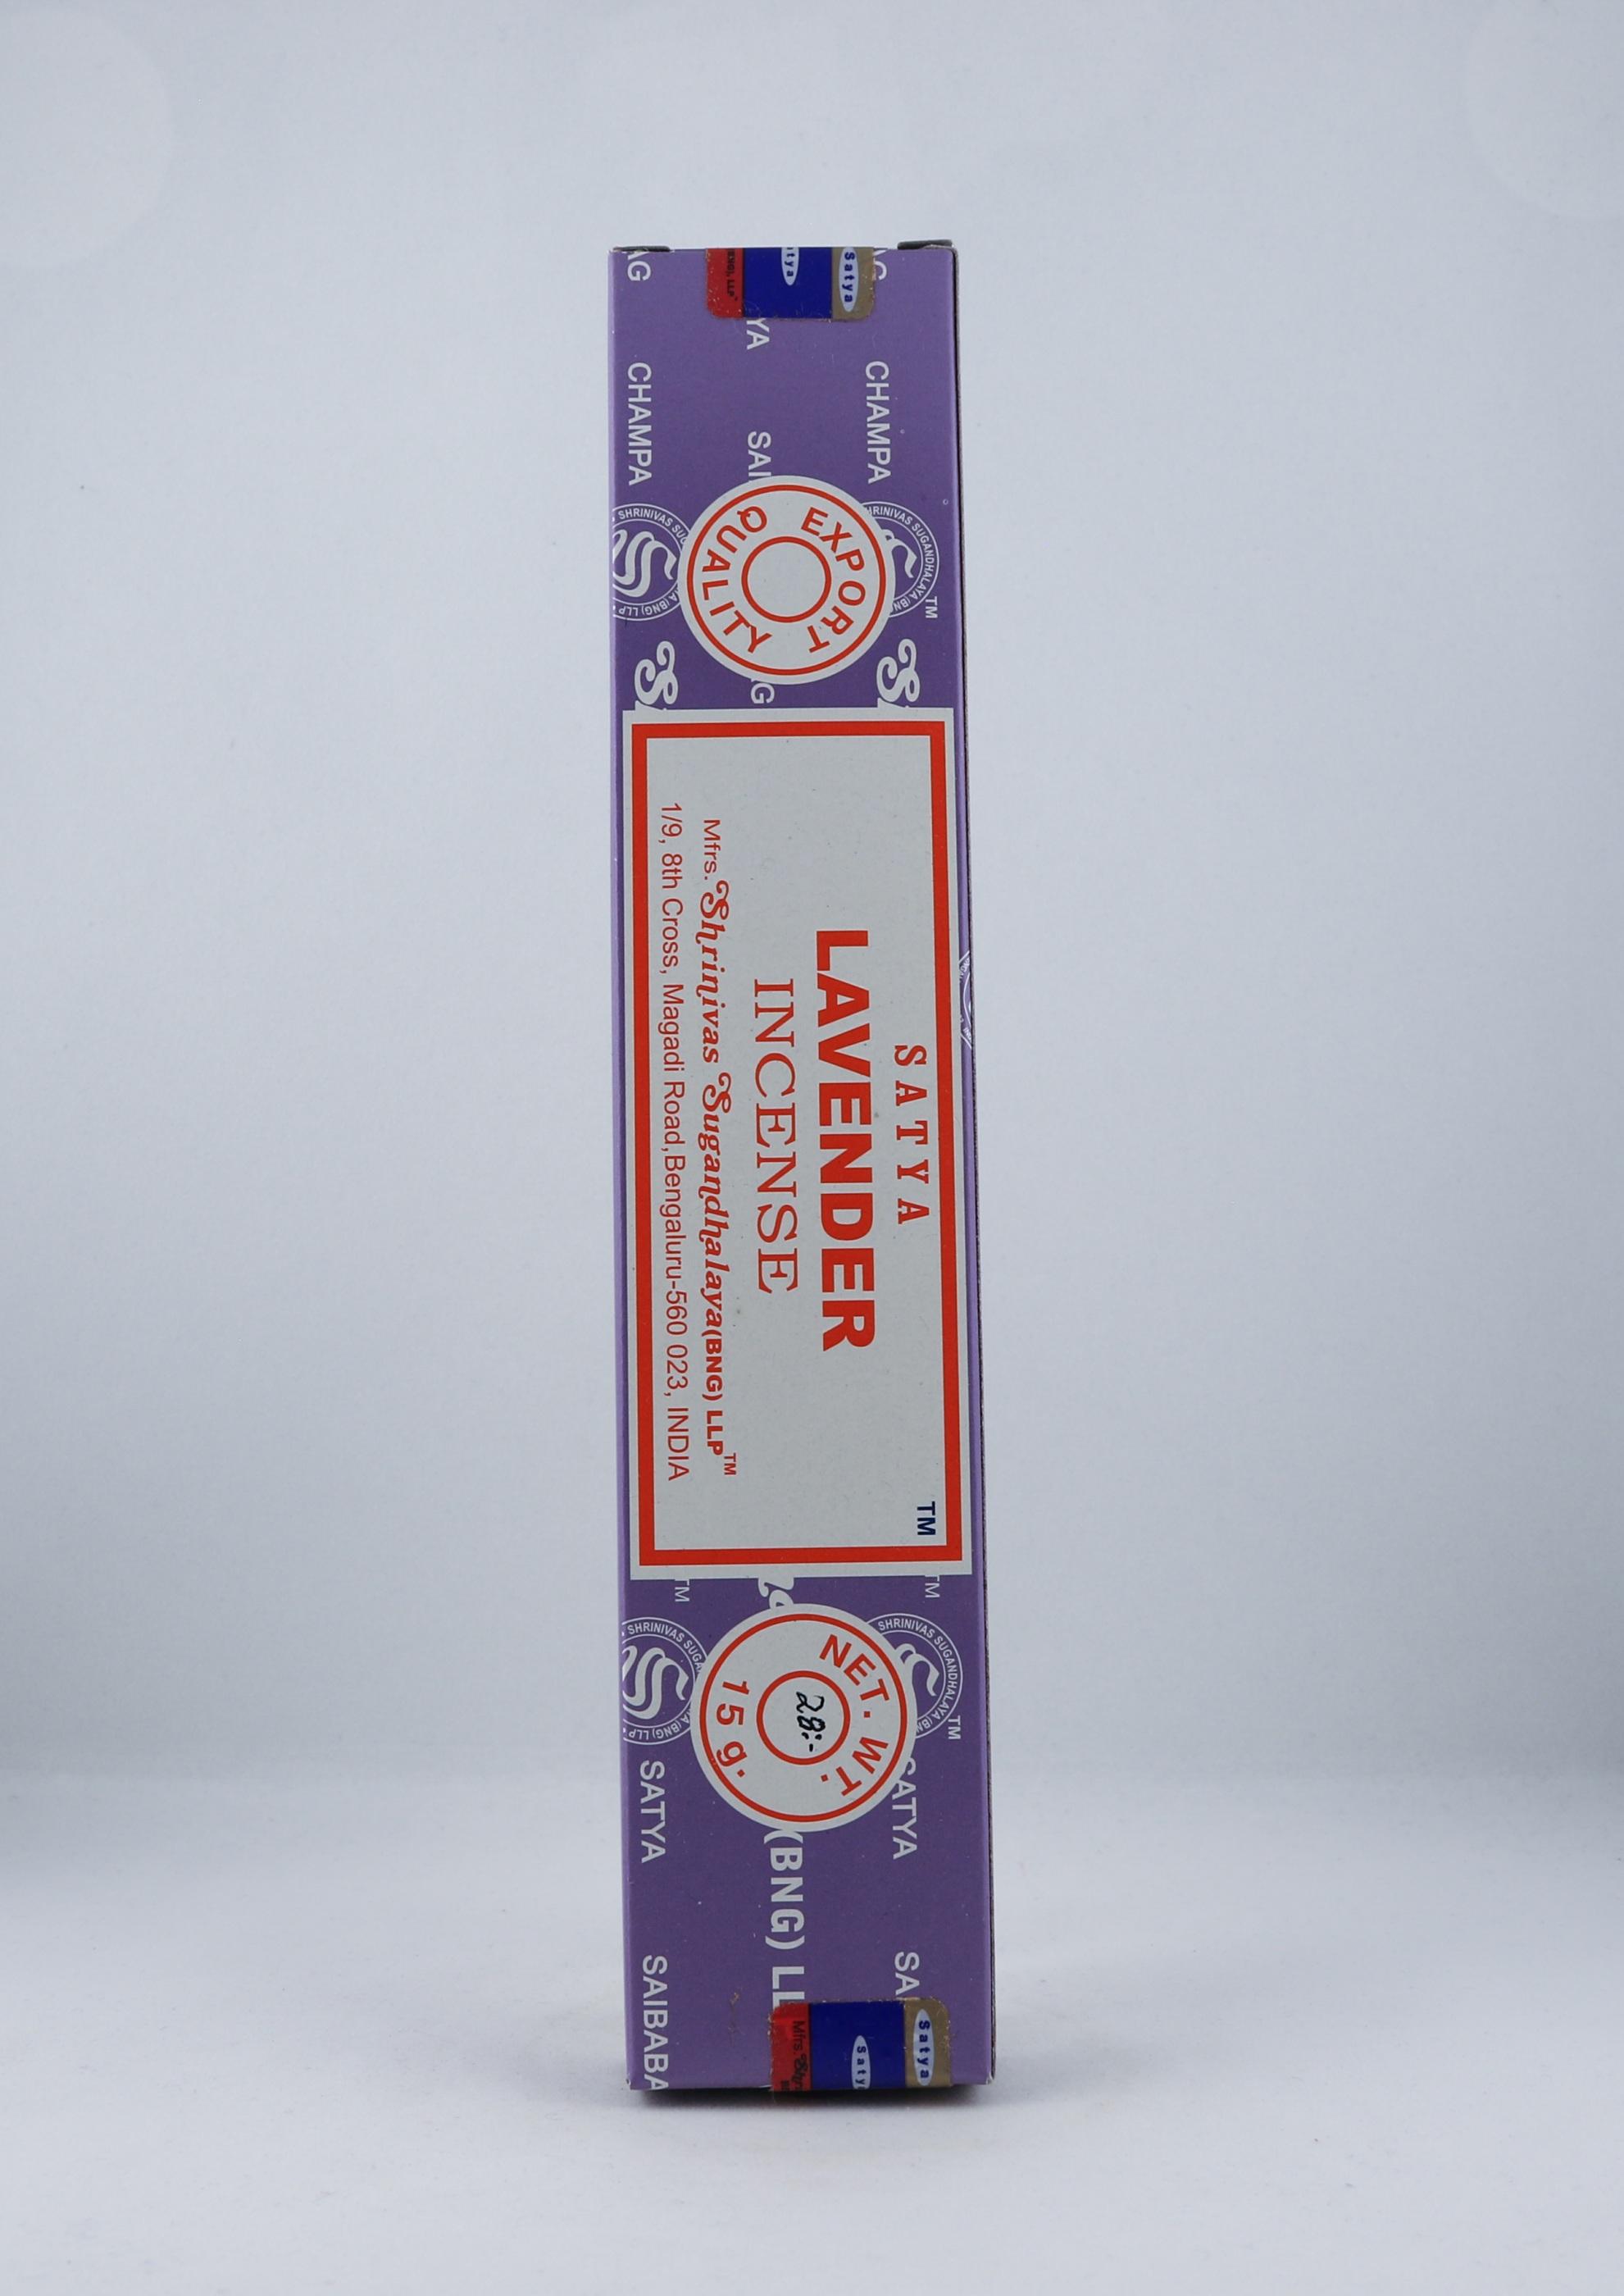 Lavendel rökelse Wellness Ayurveda Halmstadmassören Halmstad Sverige Sweden svensk aroma aromer